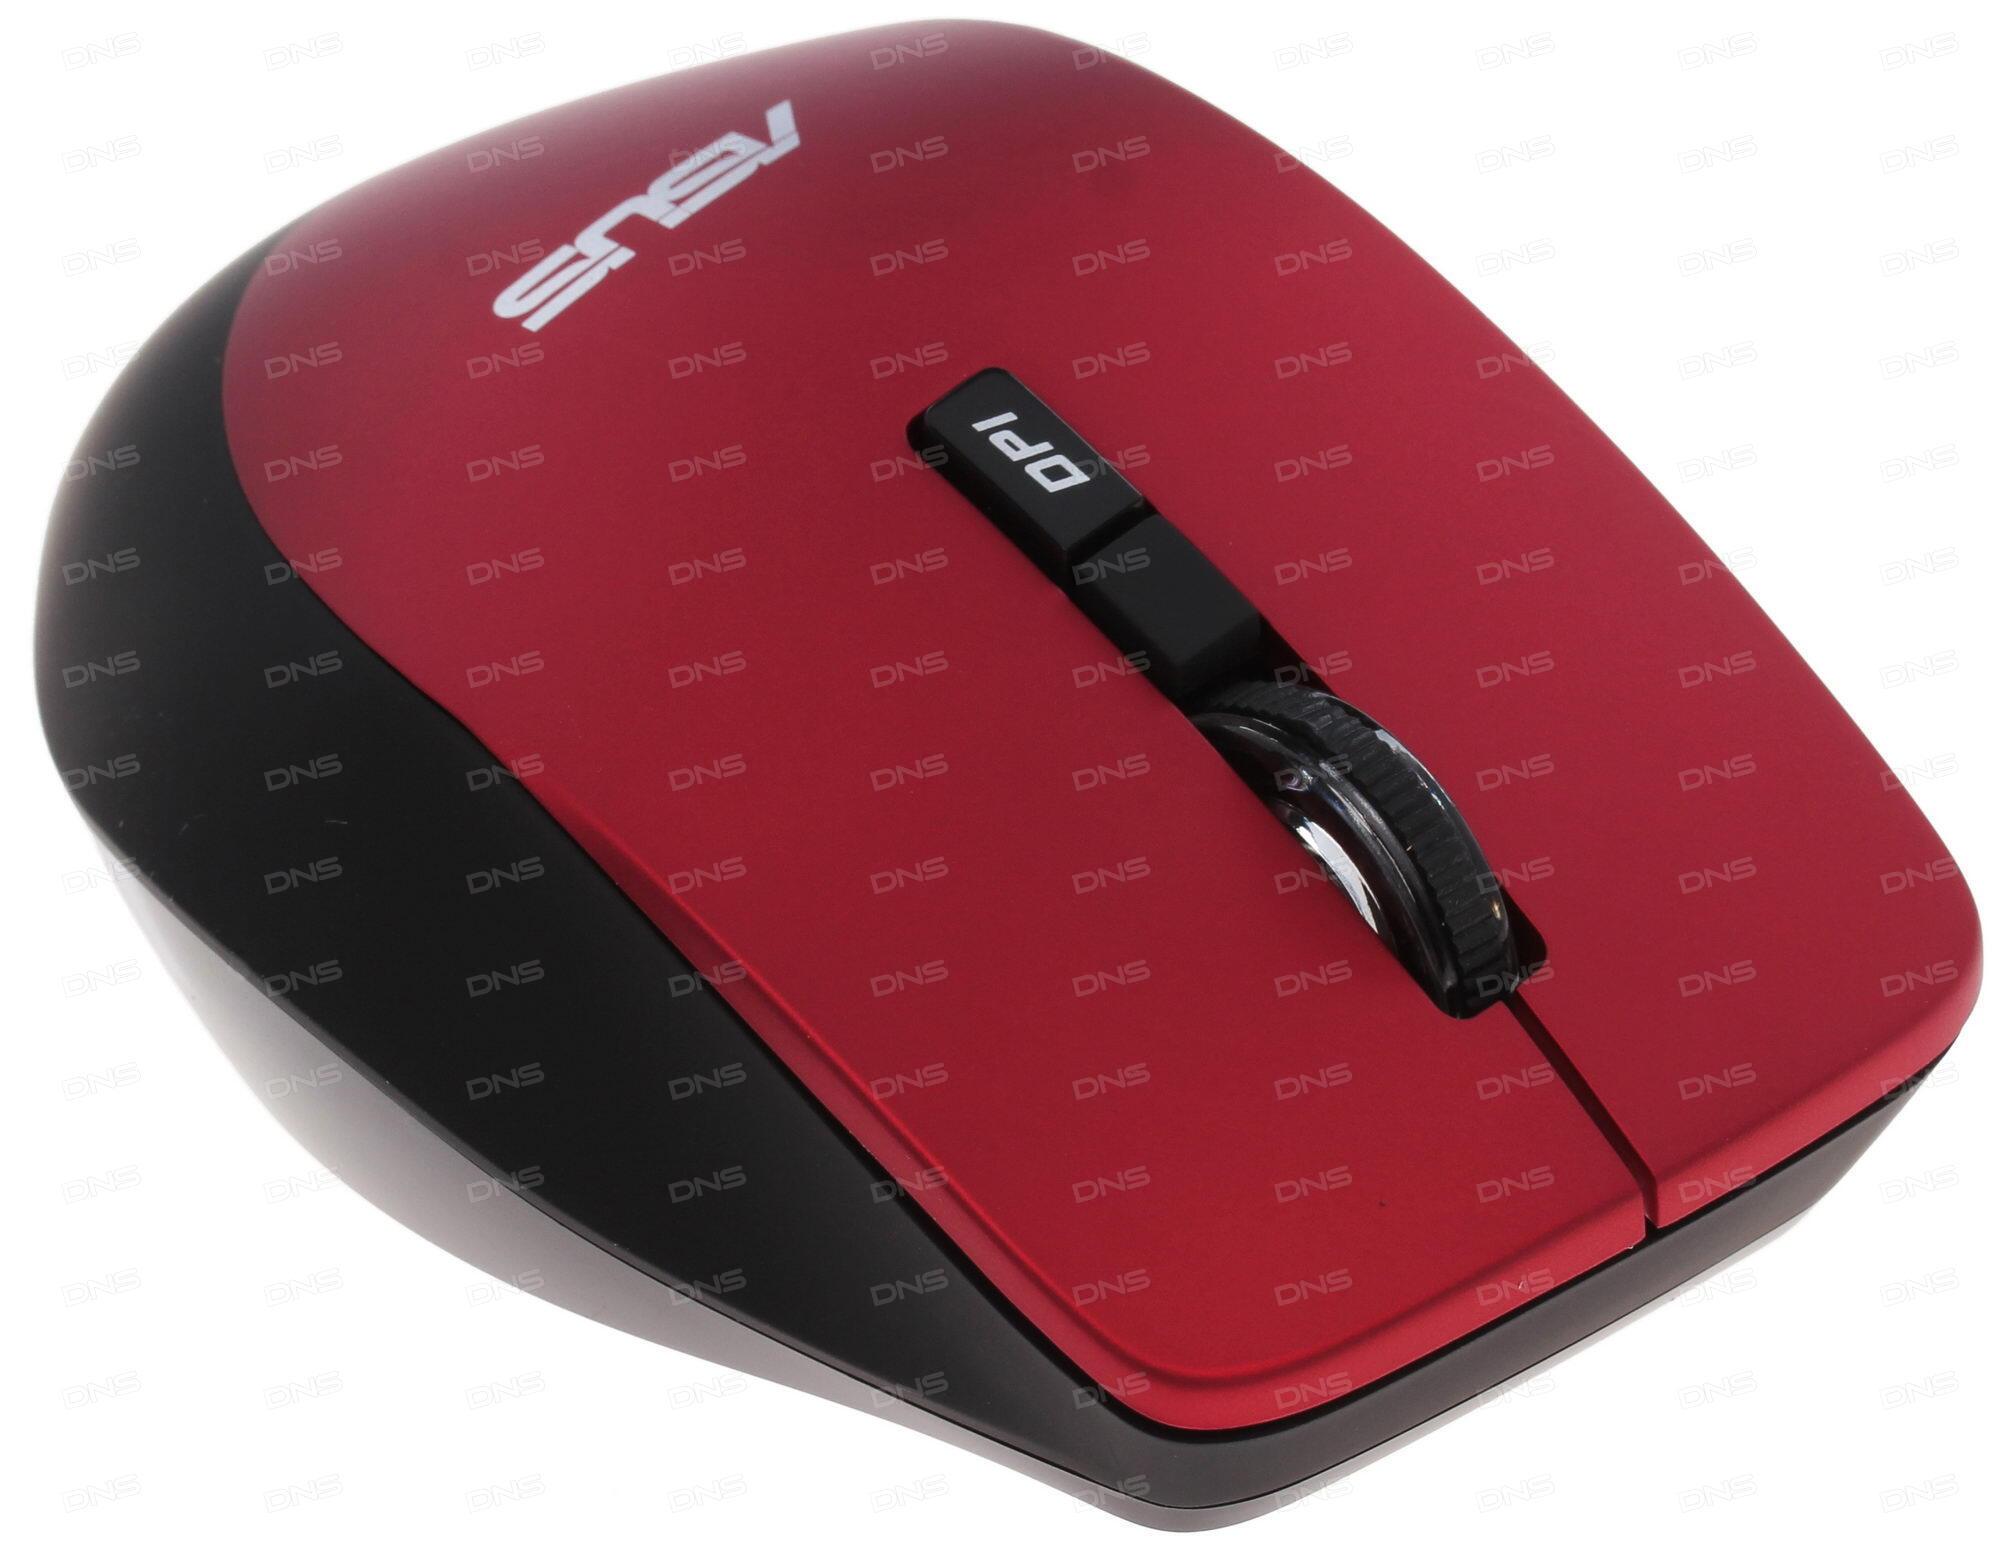 Беспроводная мышь ASUS WT425 2.4GHz/1000dpi/1600dpi/optical/wireless/adapter connects to a USB 2.0/цвет синий